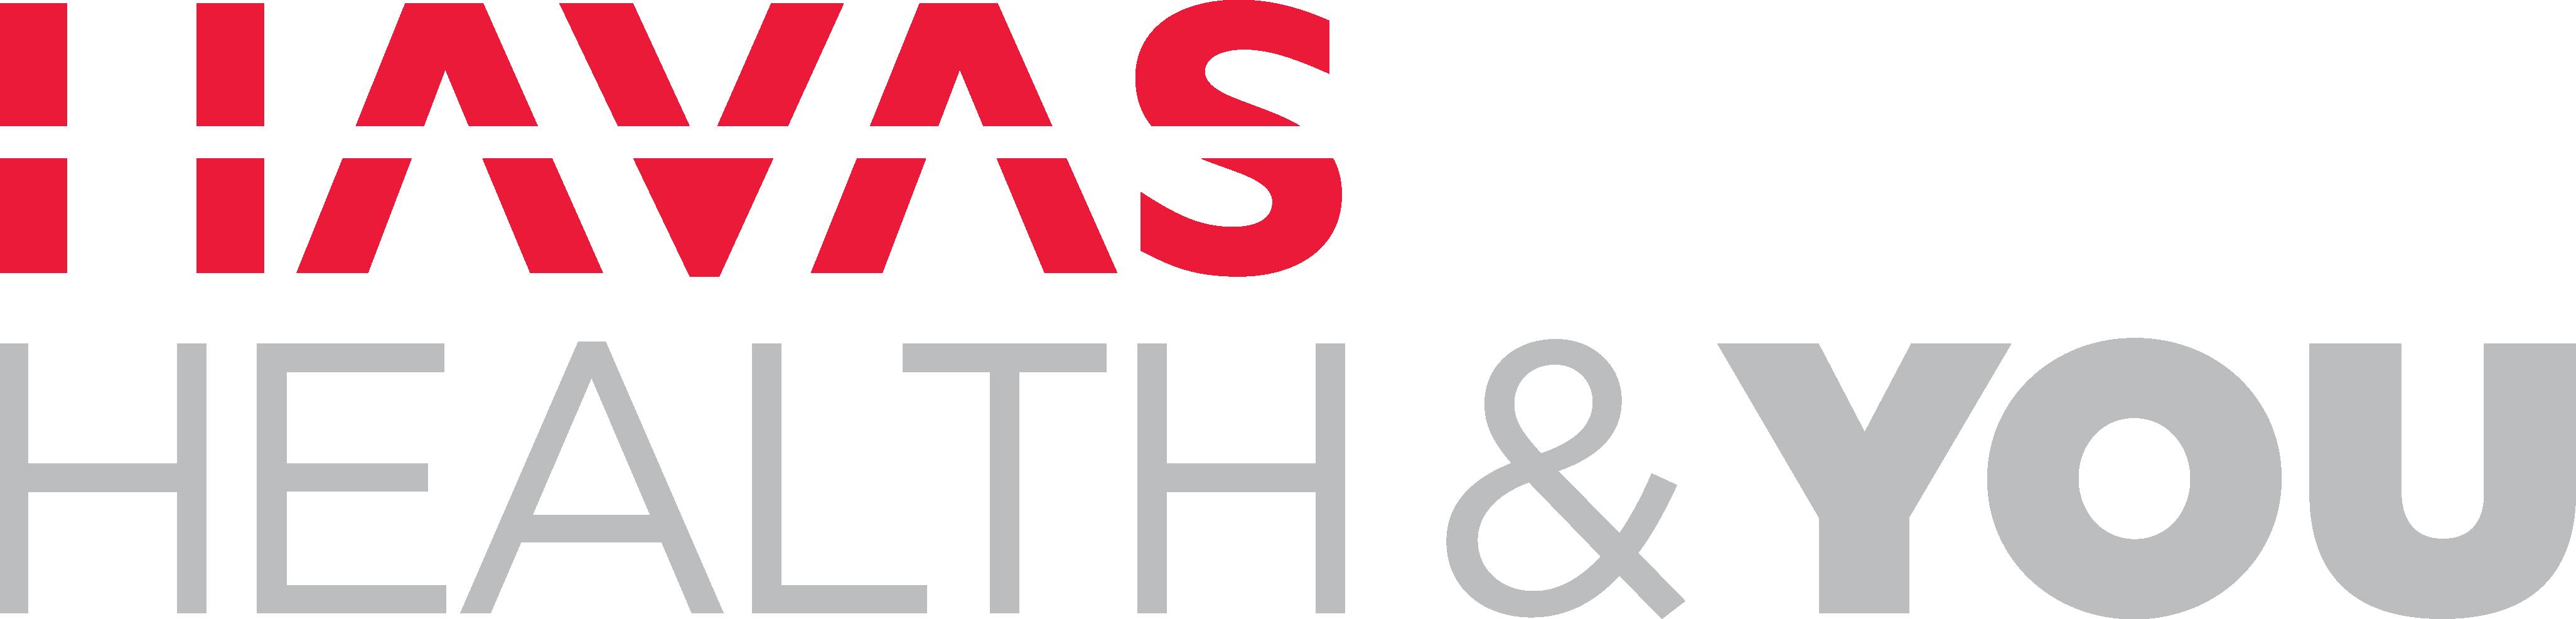 HavasHY_Logo